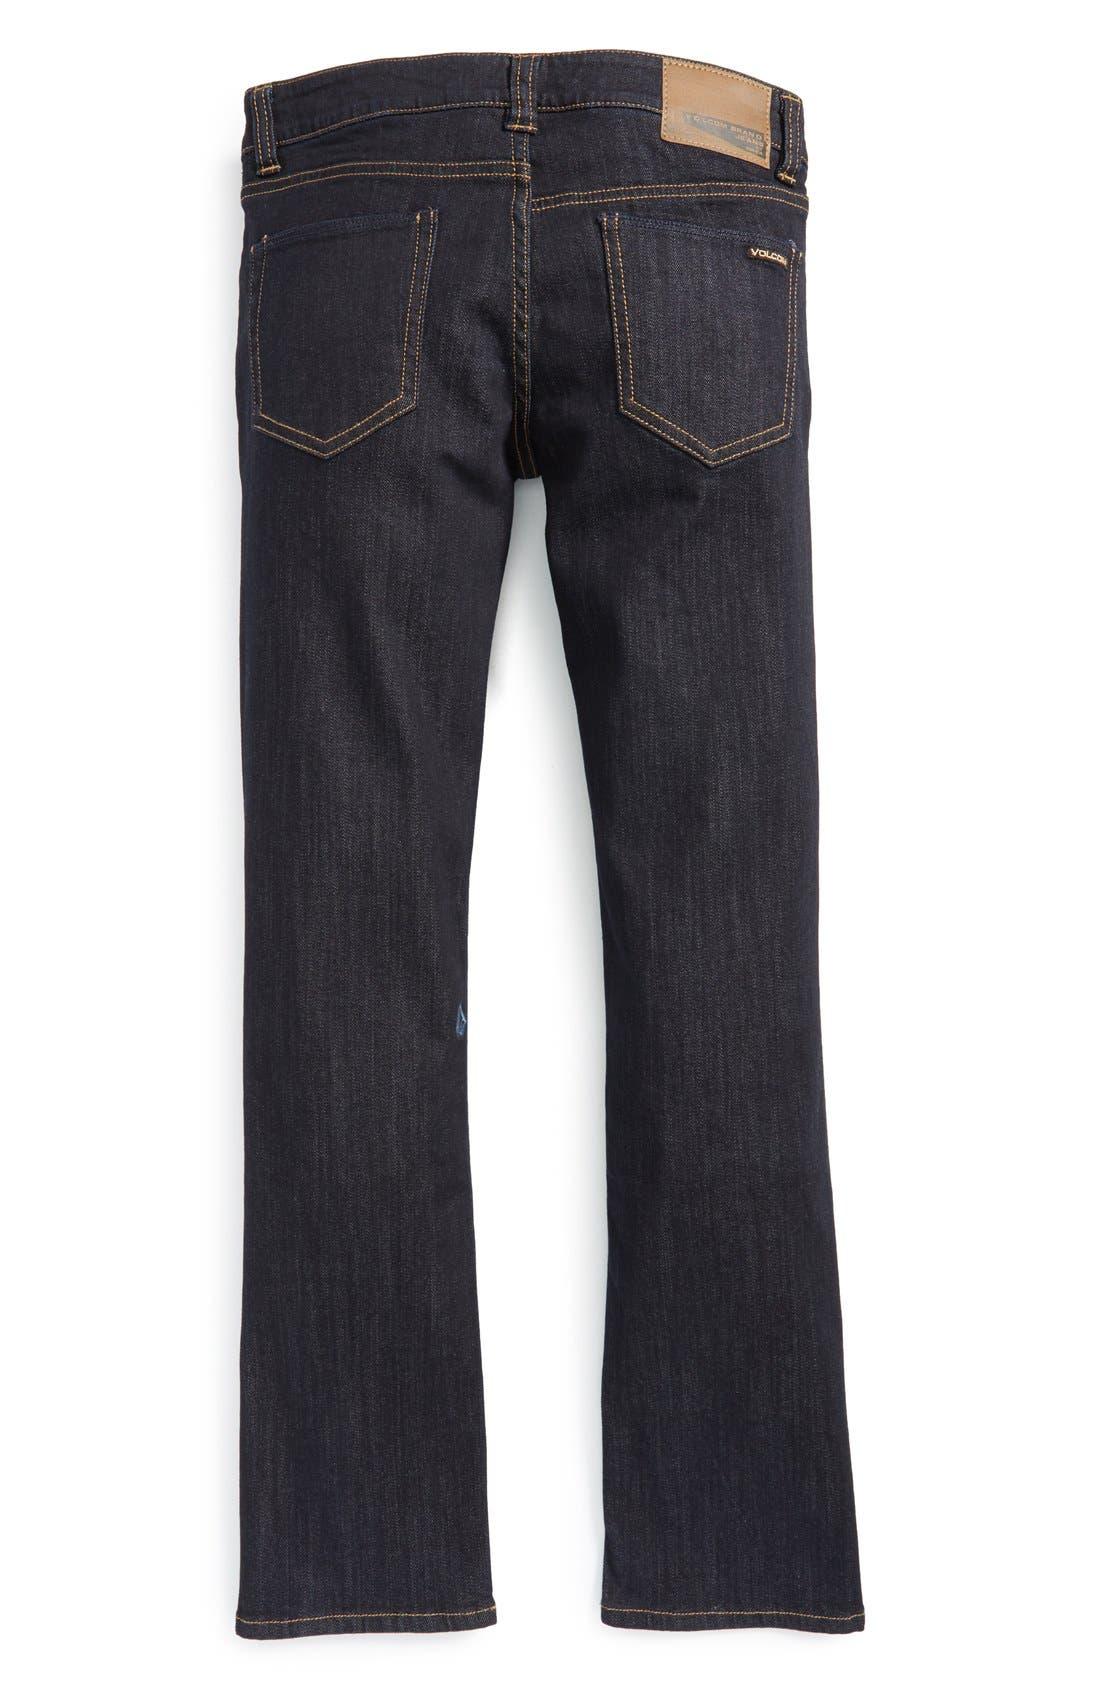 Volcom 'Vorta' Slim Fit Jeans (Little Boys)